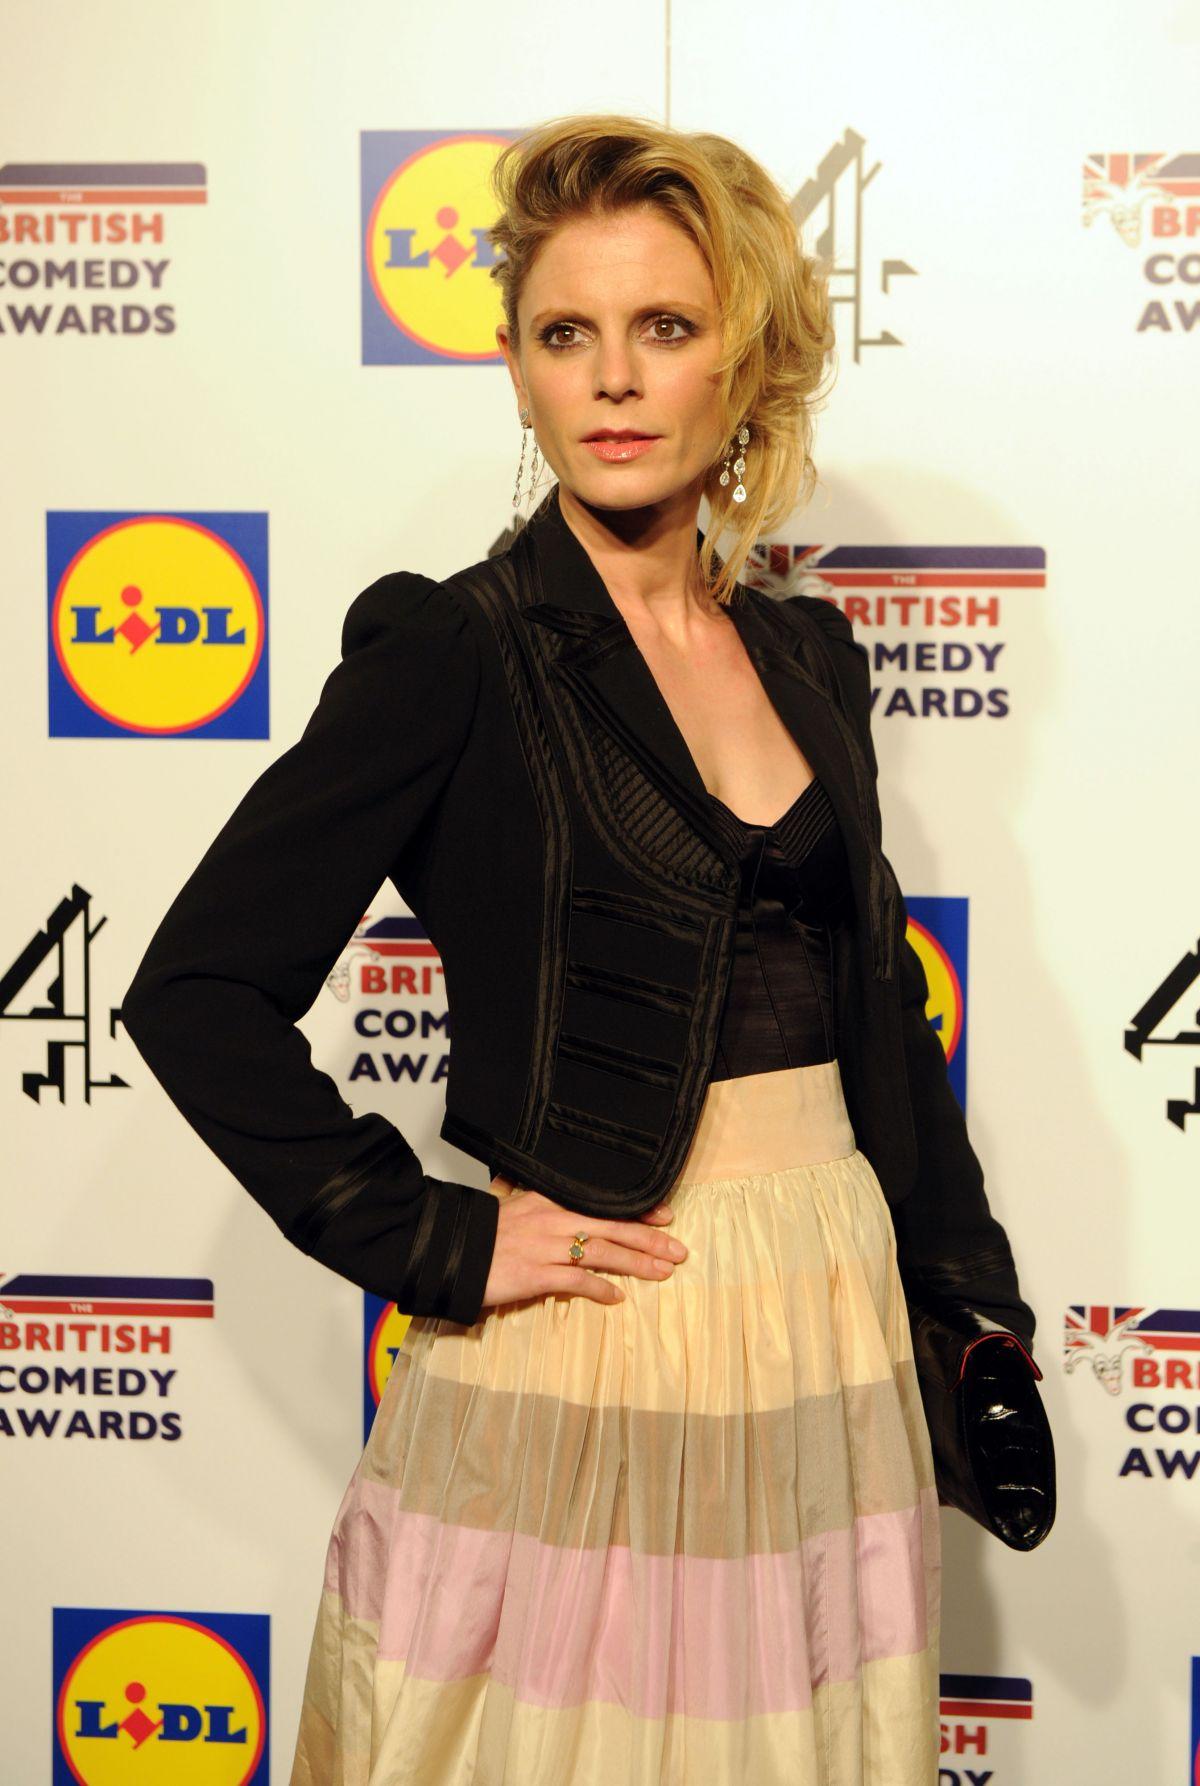 EMILIA FOX at 2014 British Comedy Awards in London